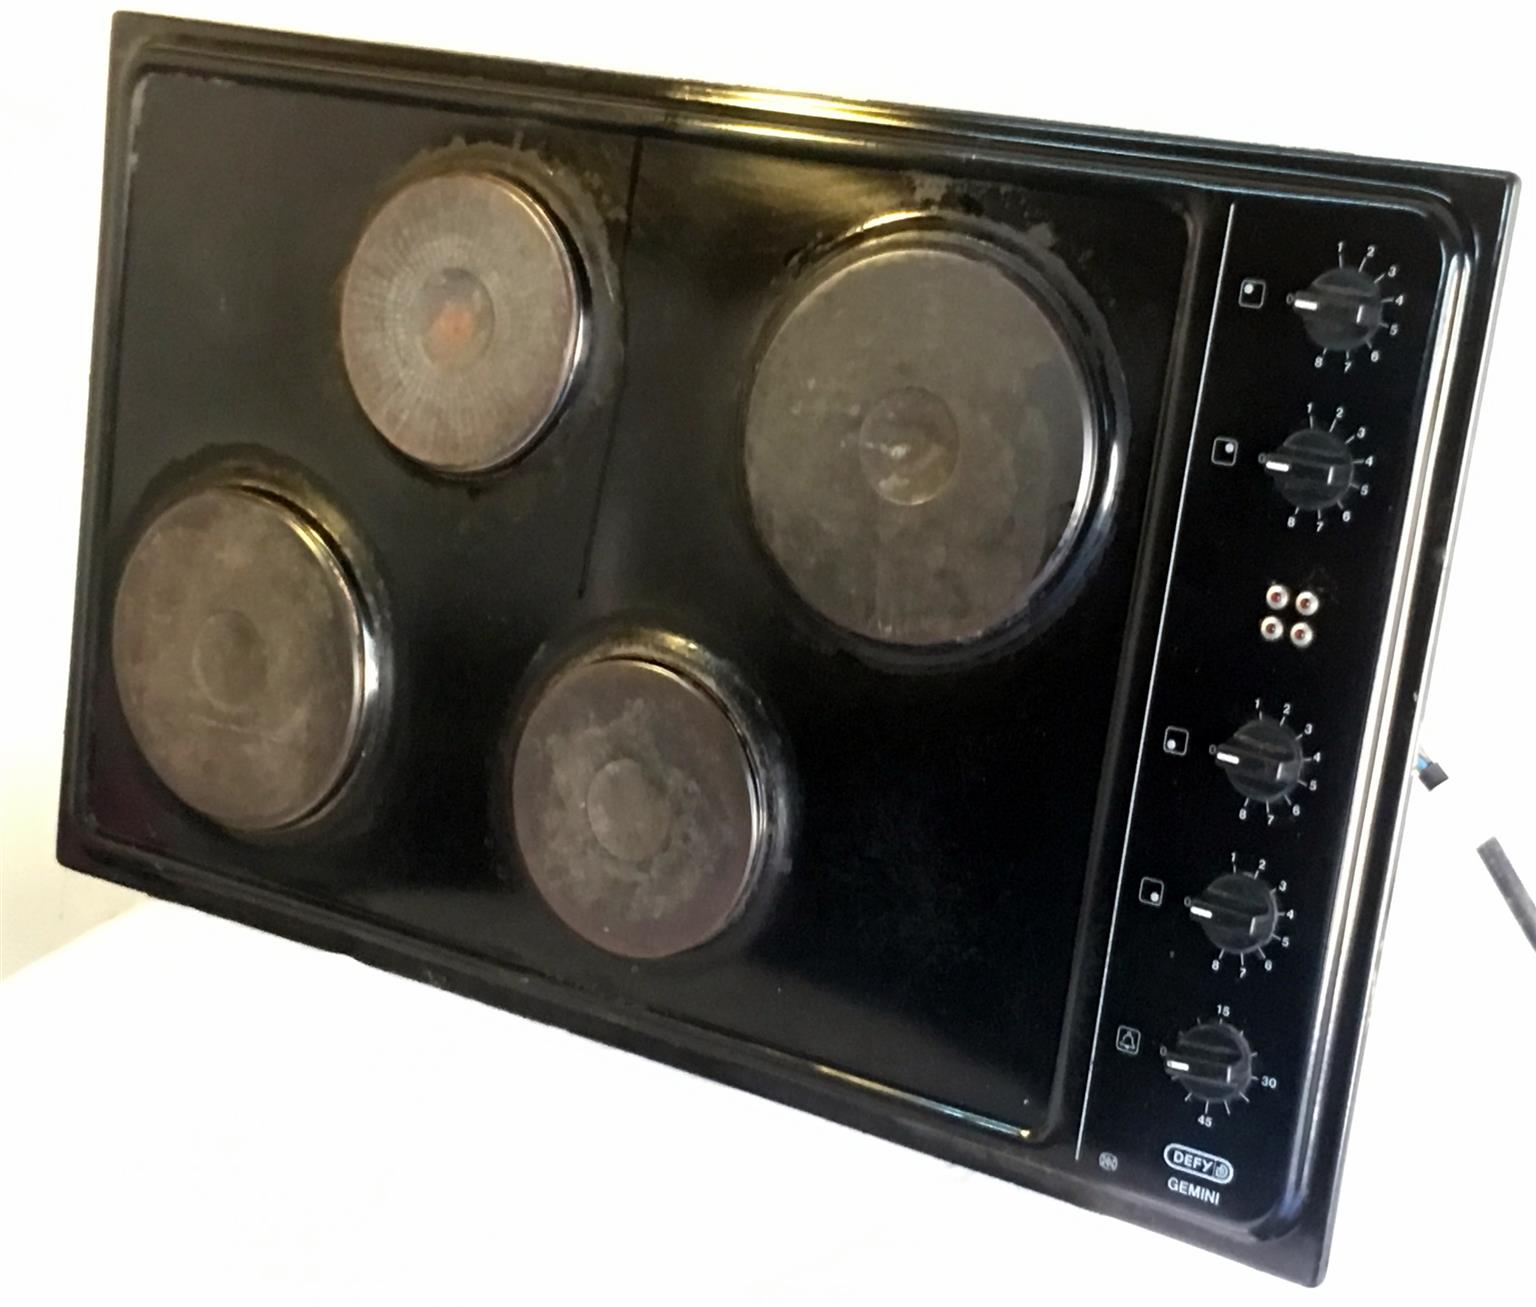 Defy Gemini Cordon Bleu oven hob combo.